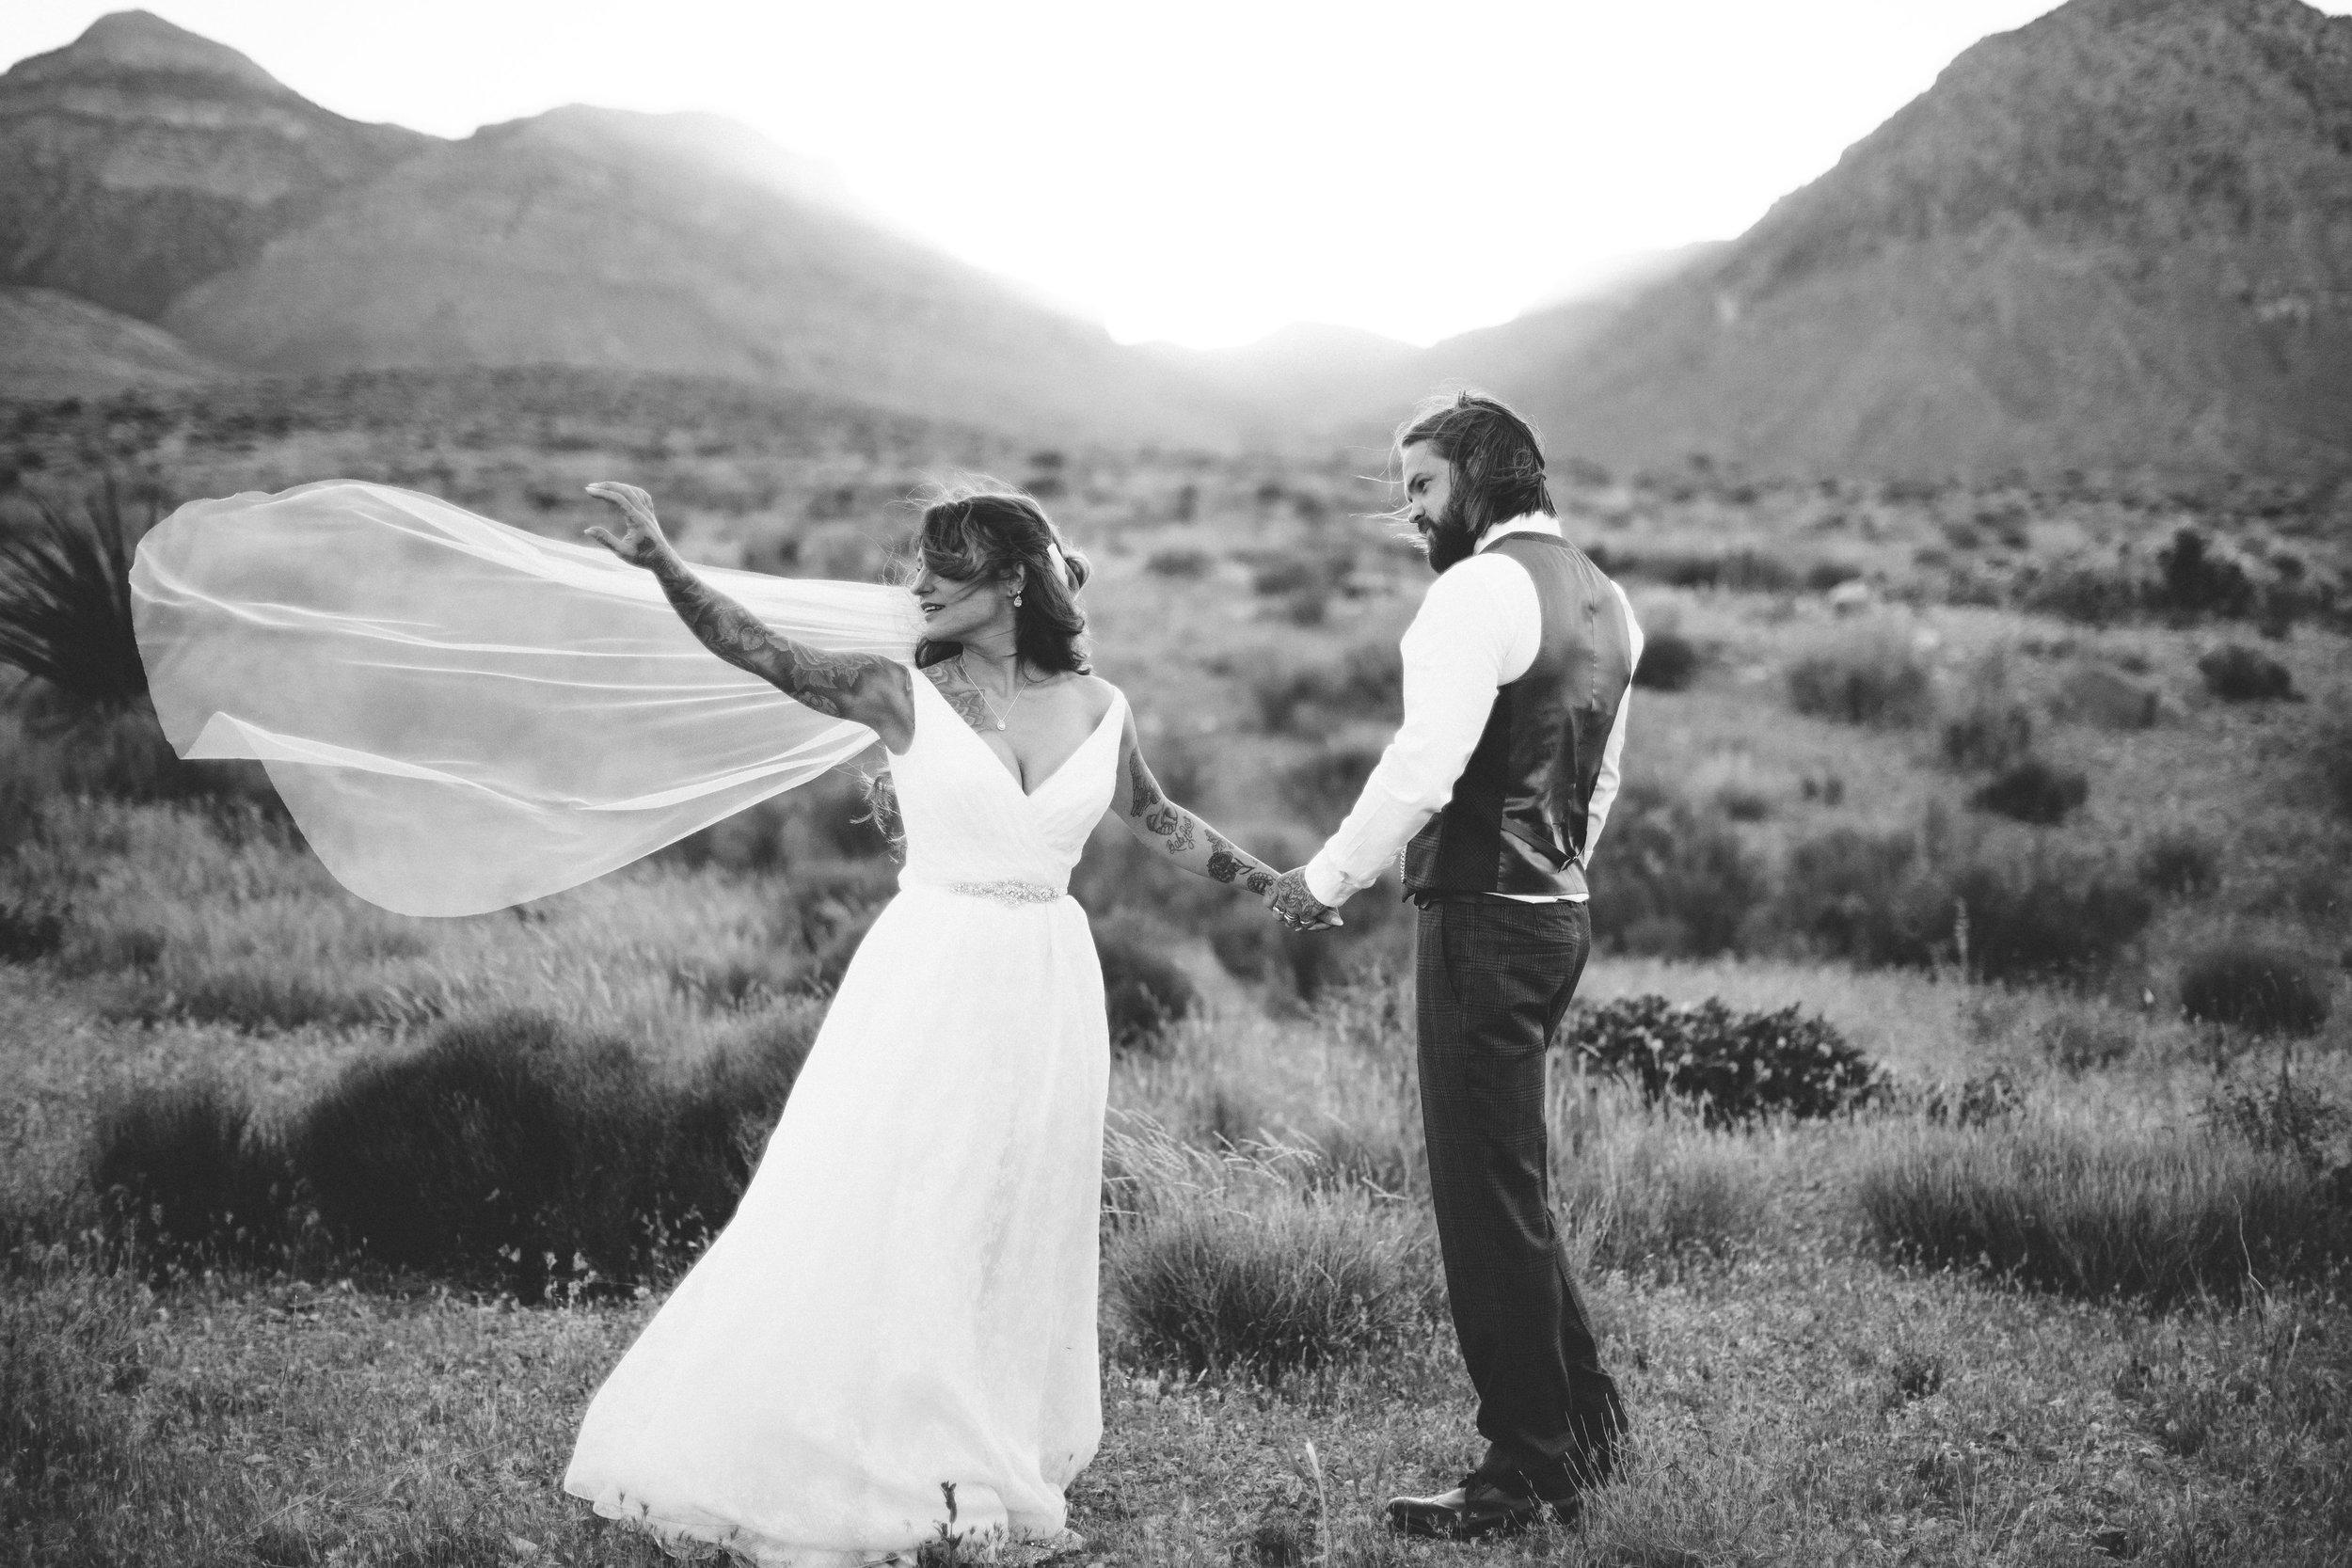 nicoletta-and-adams-rad-las-vegas-desert-elopement23.jpg